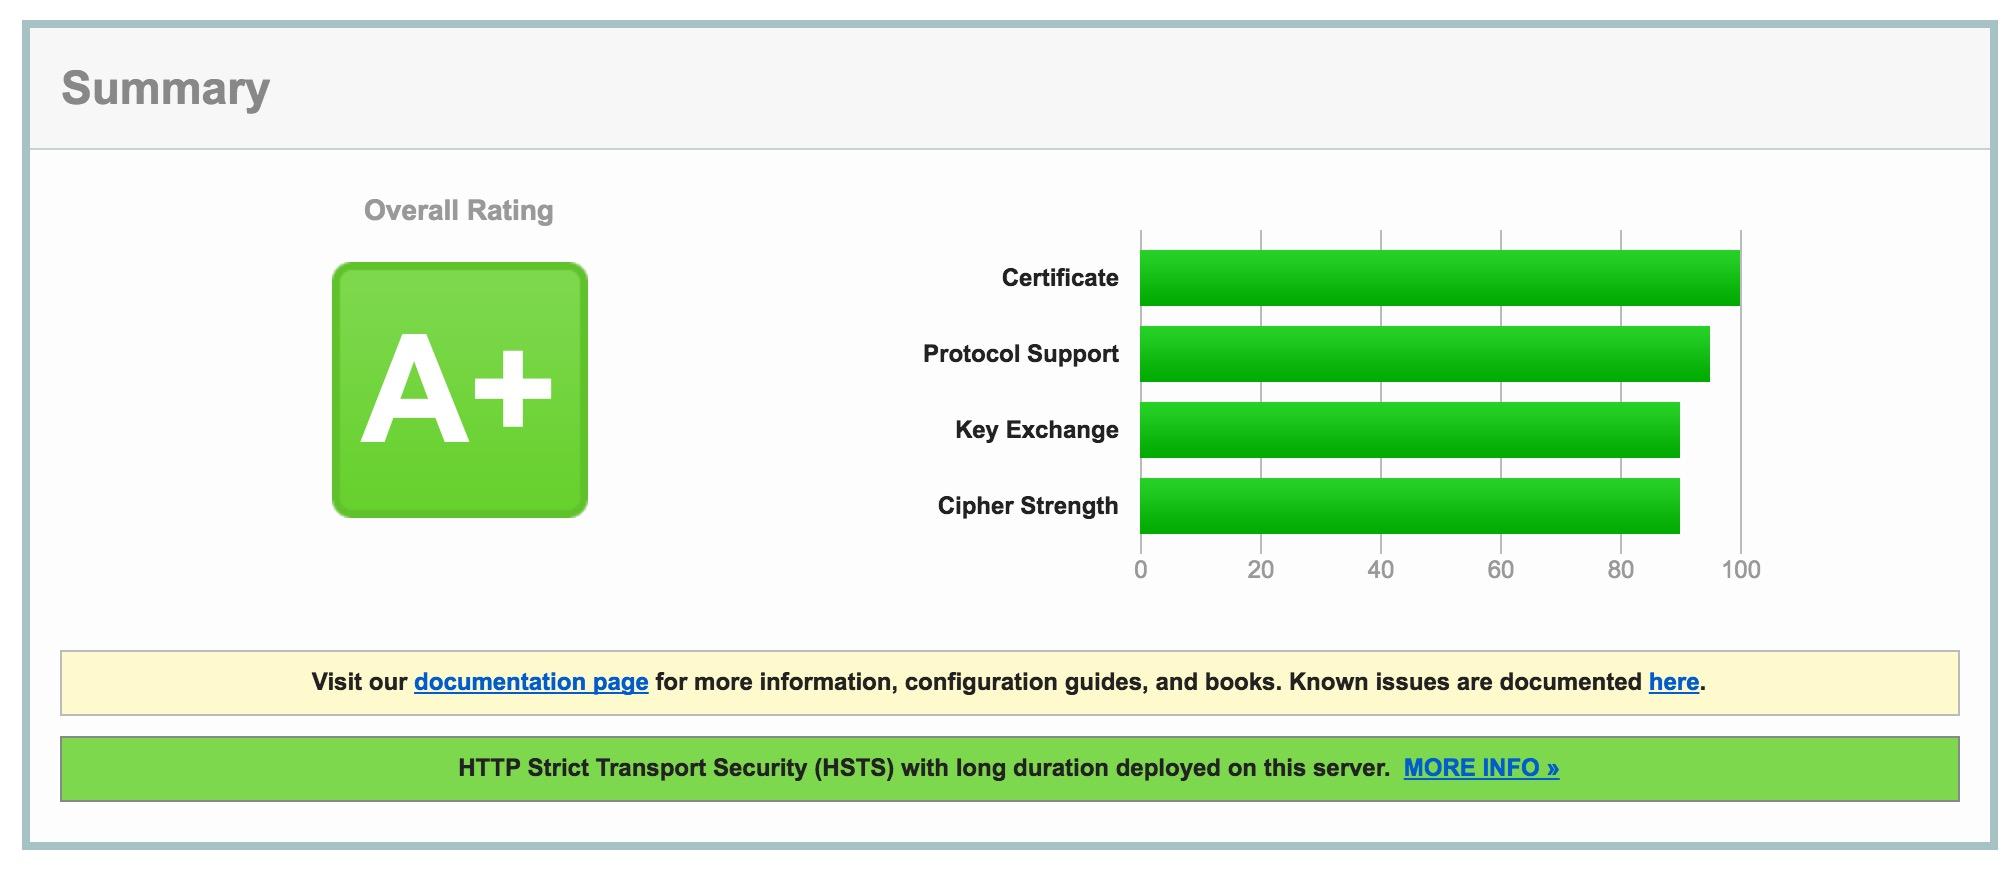 OpenLiteSpeed 开启 HTTPS 并调教 A+ 跑分-米饭粑